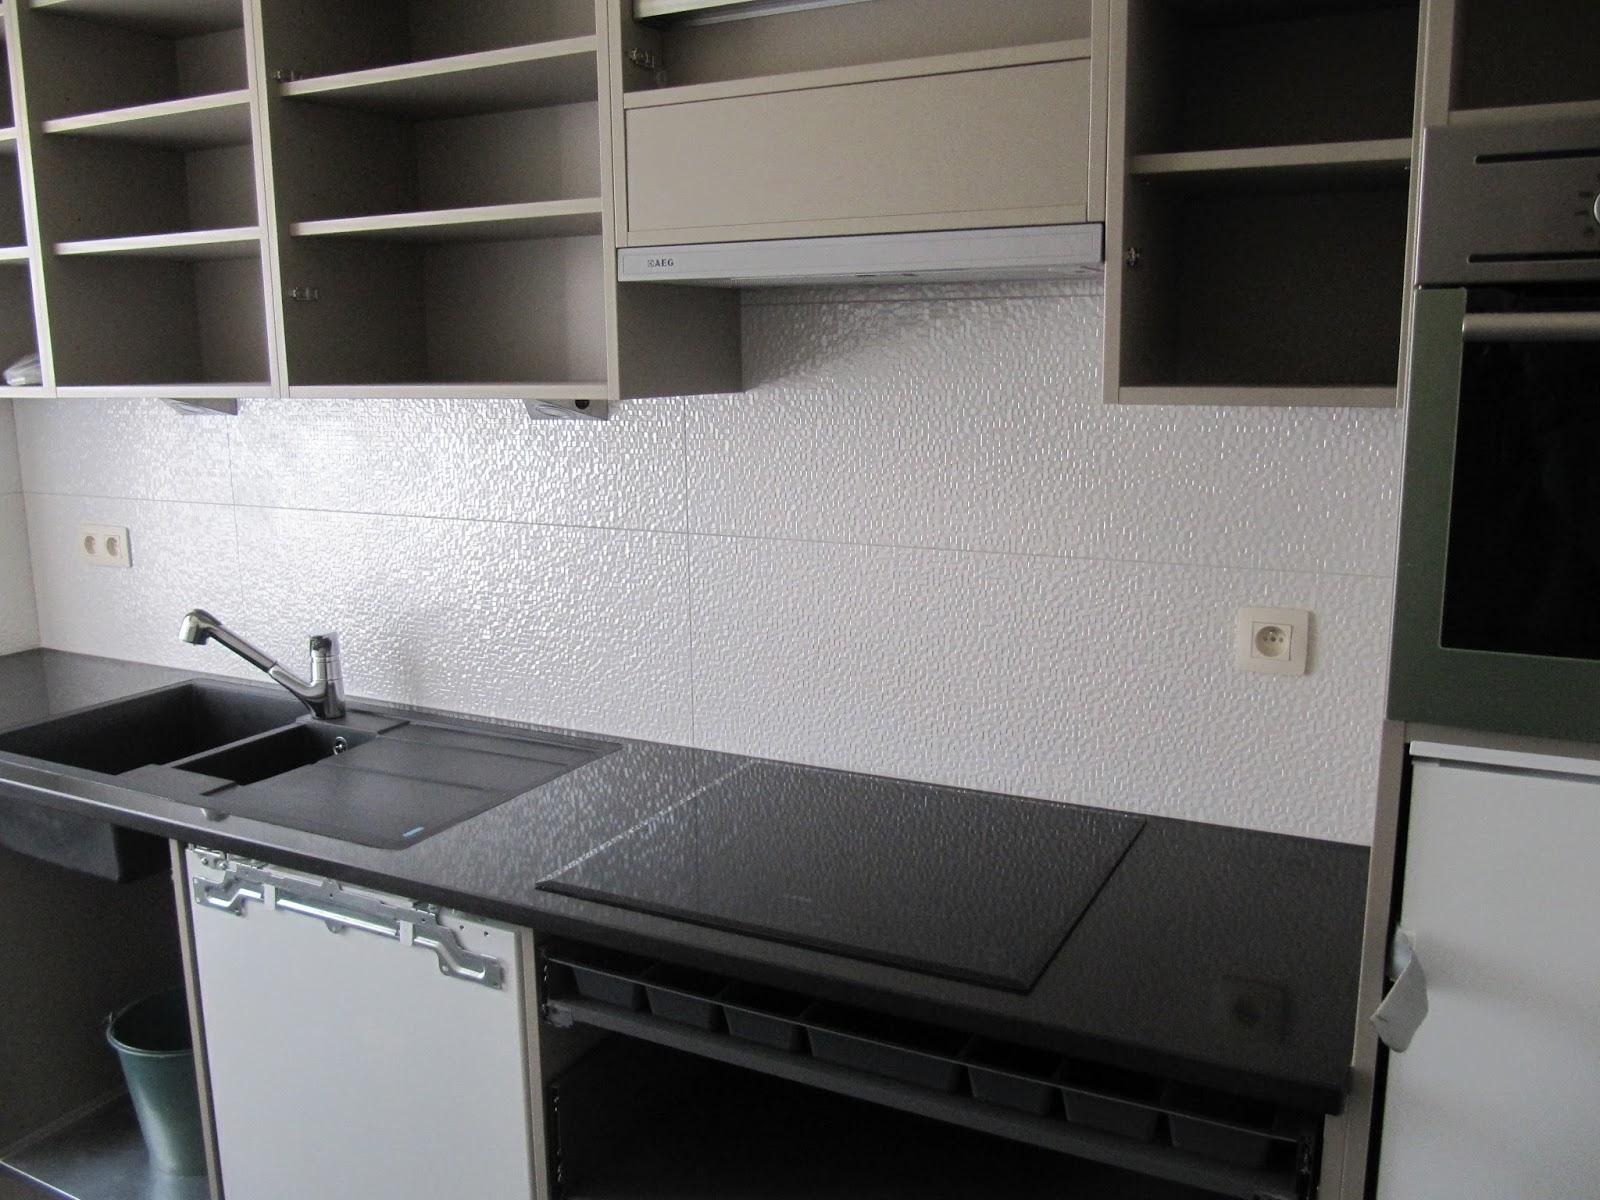 keuken wandtegels oud hollands : Nl Funvit Com Keuken Met Tegels